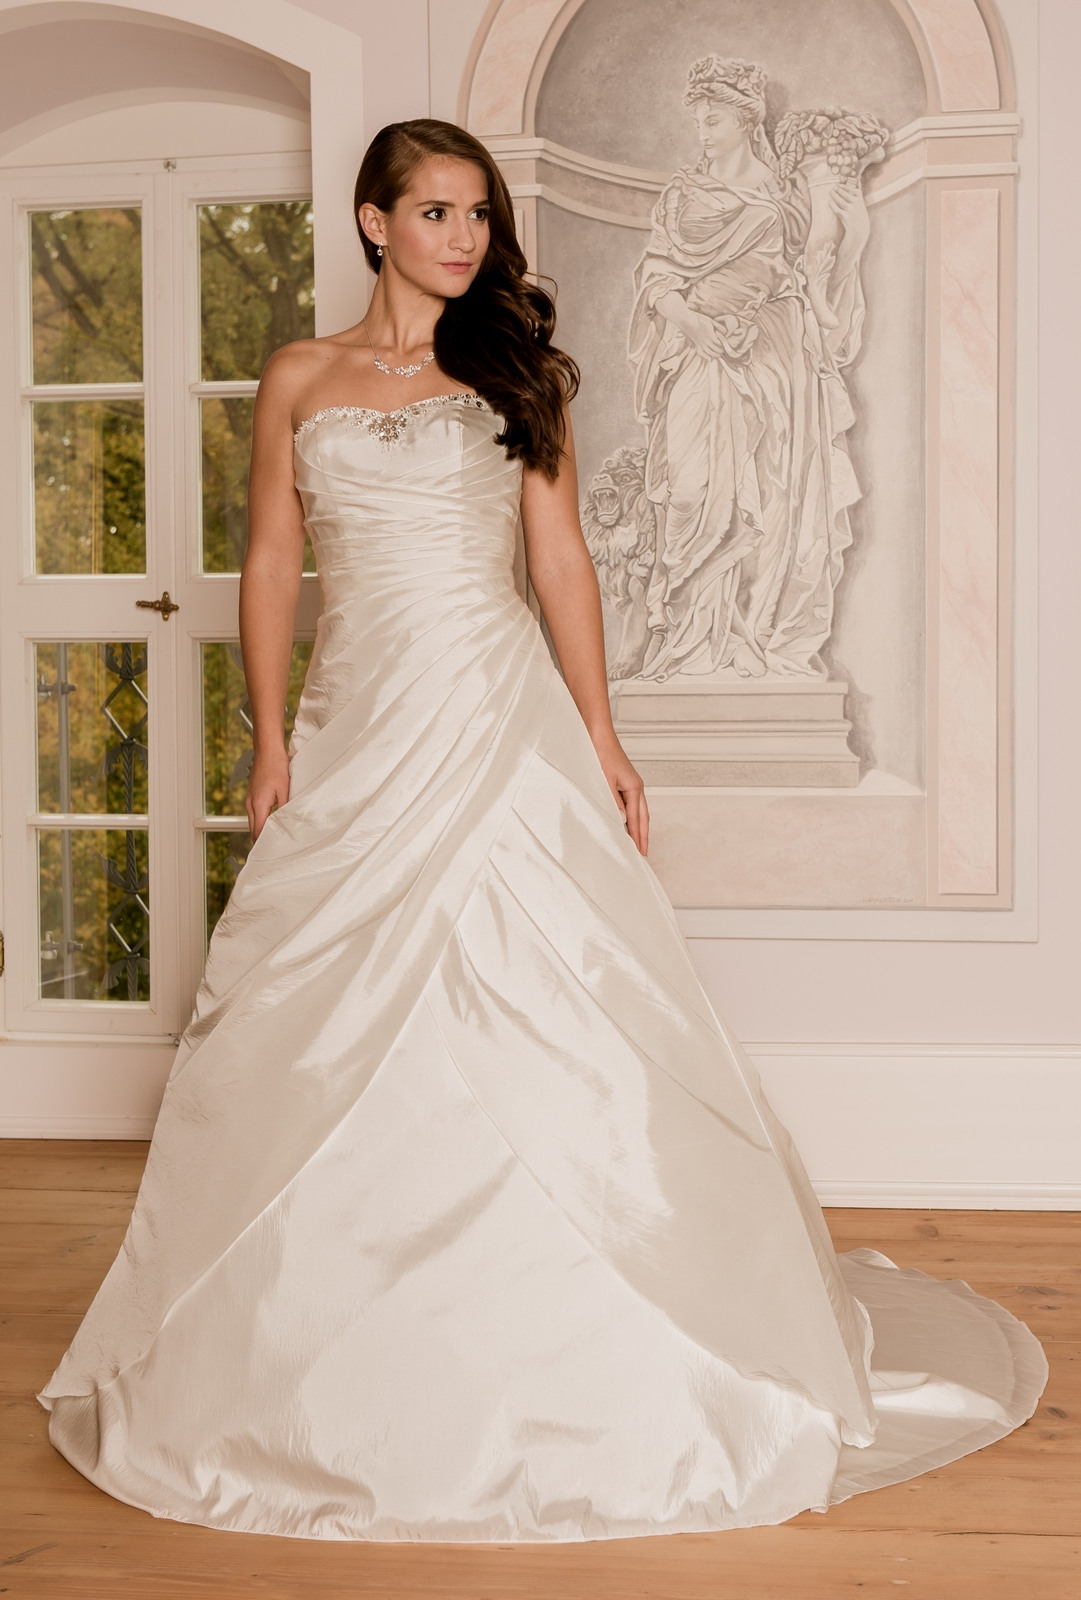 Hochzeitskleid Nadine 204 - Typ: Brautkleid Nadine Zürich